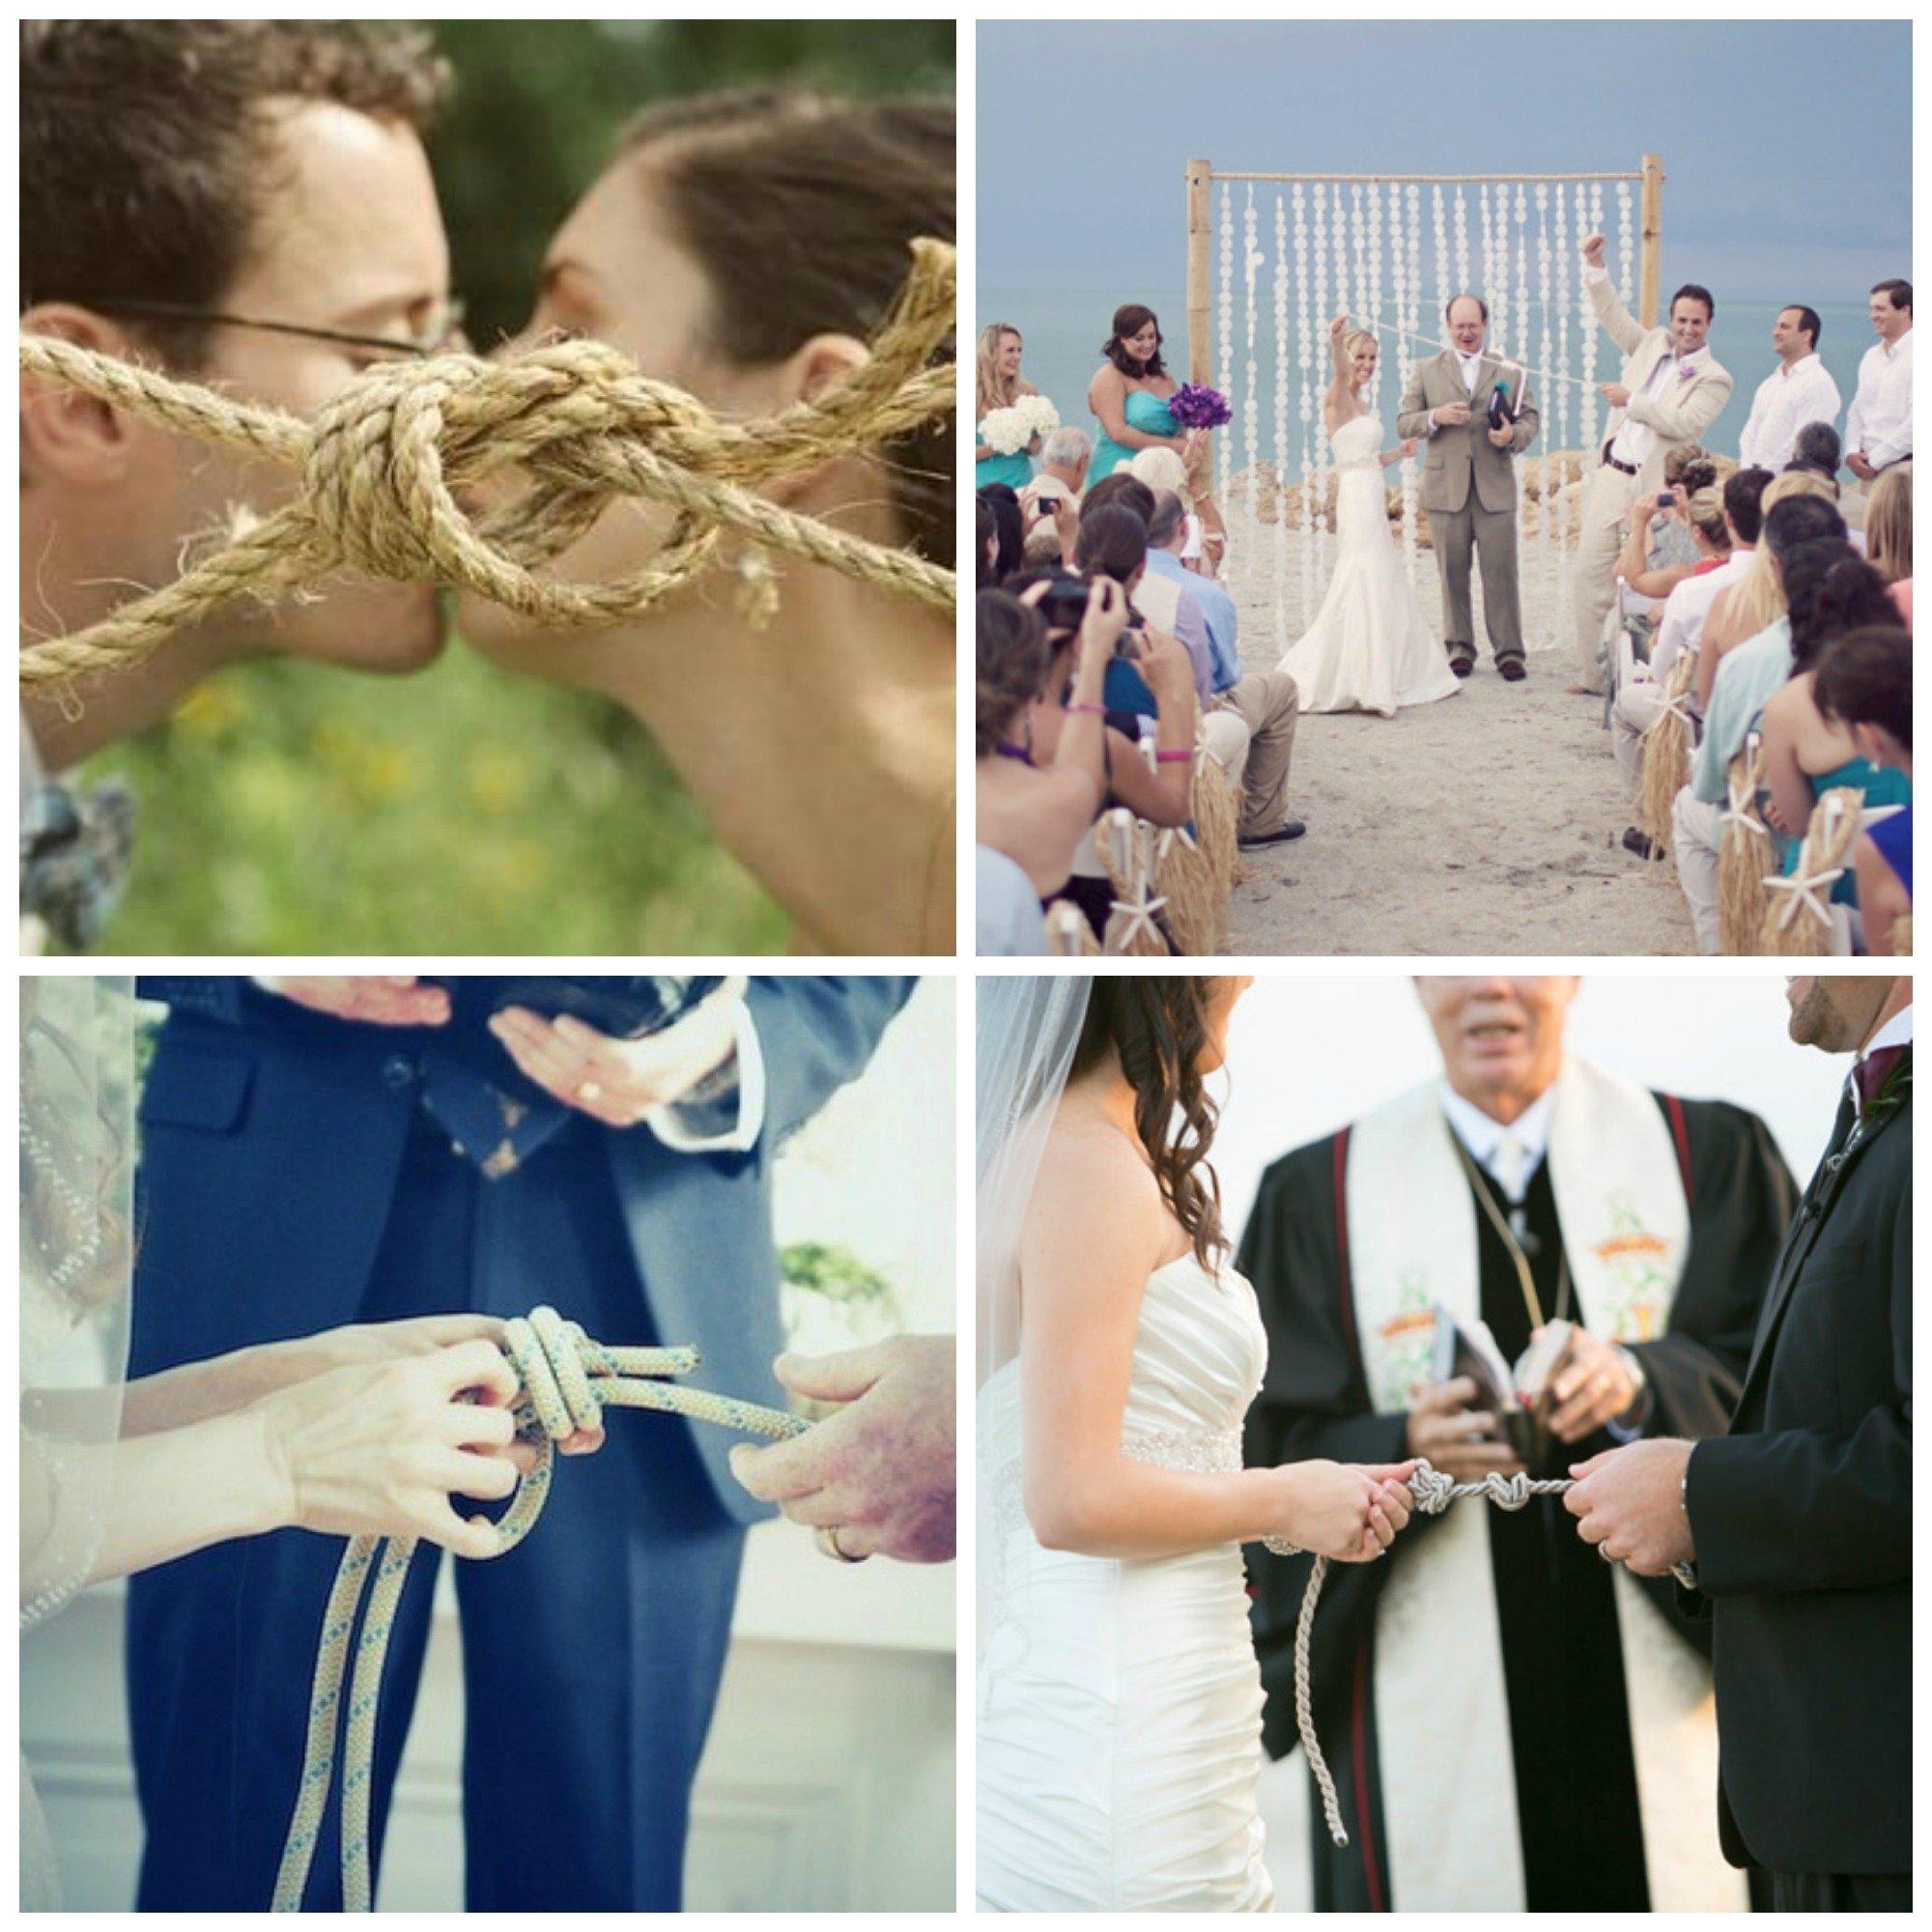 10 Beautiful Unity Ideas For Wedding Ceremony creative wedding ceremony rituals inspirational wedding ideas